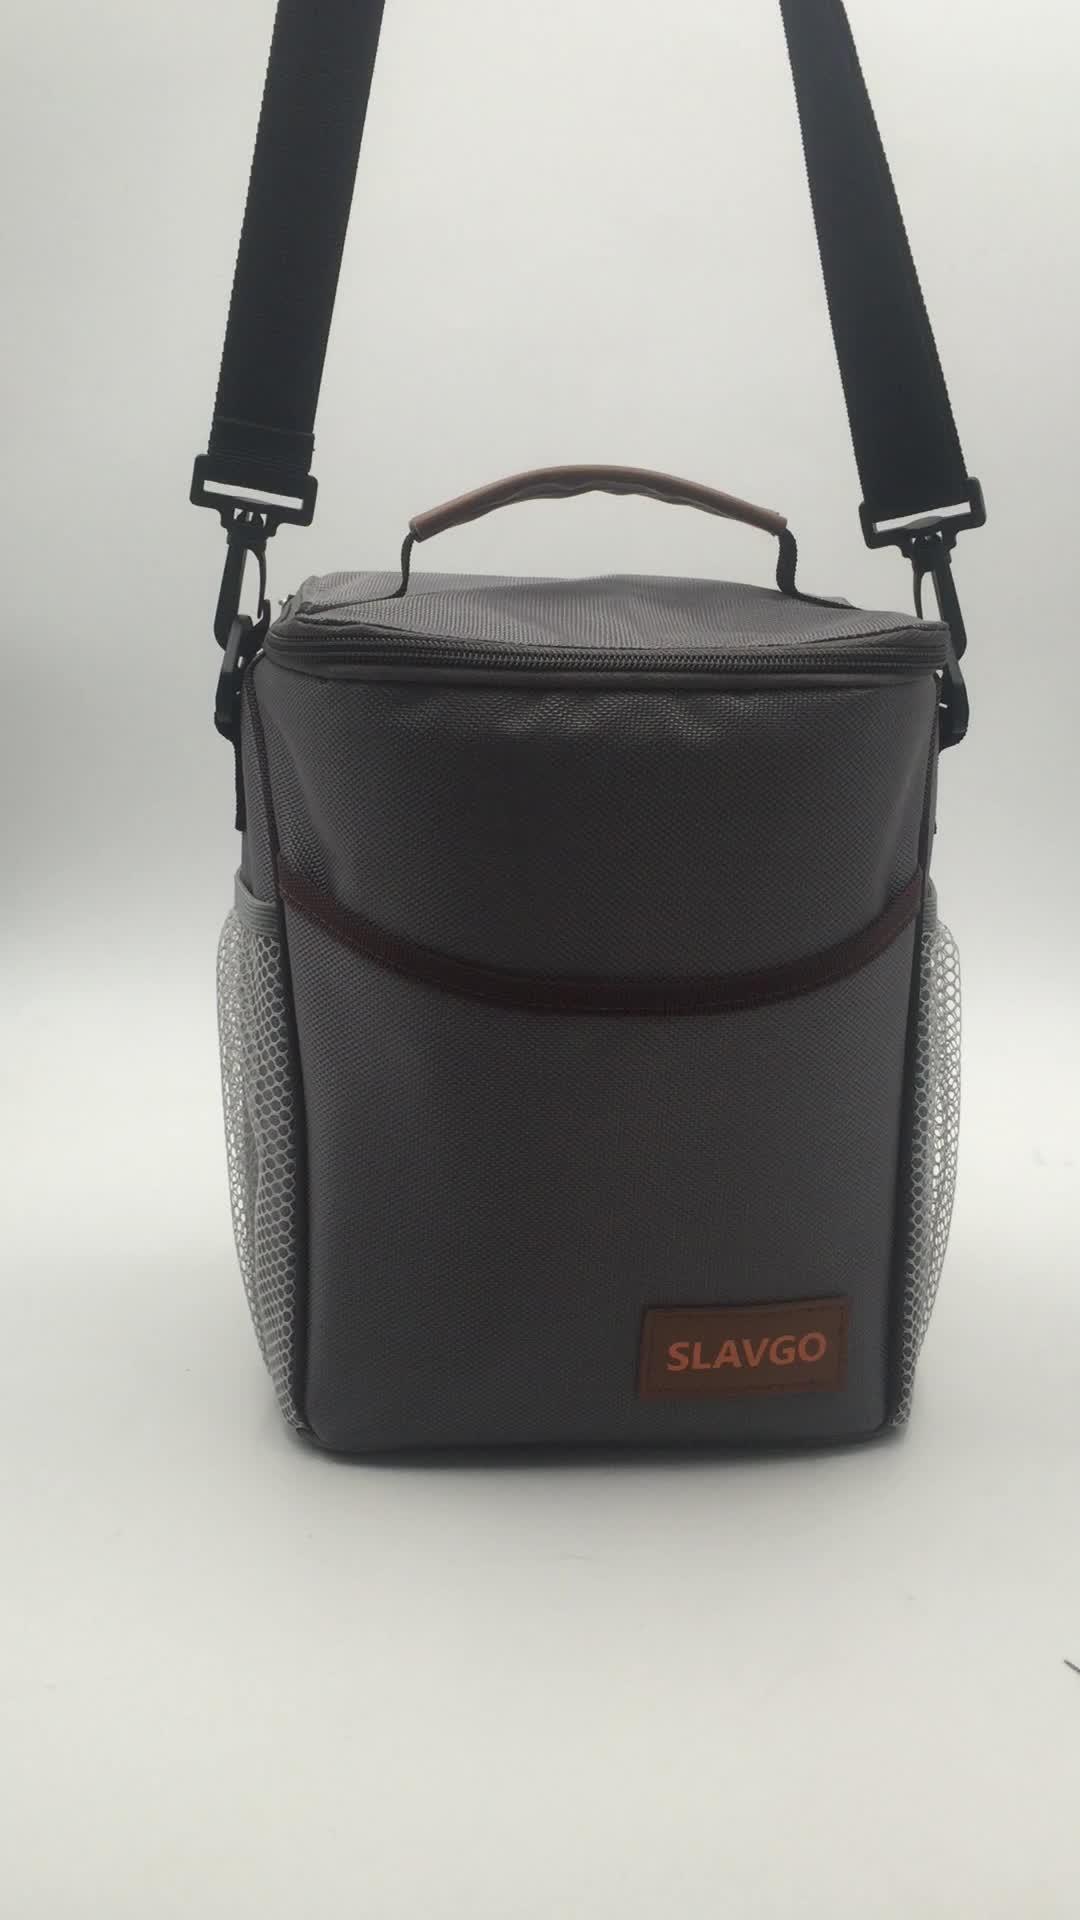 Portable Reusable Freezable Cooler Lunch Bag Buy High